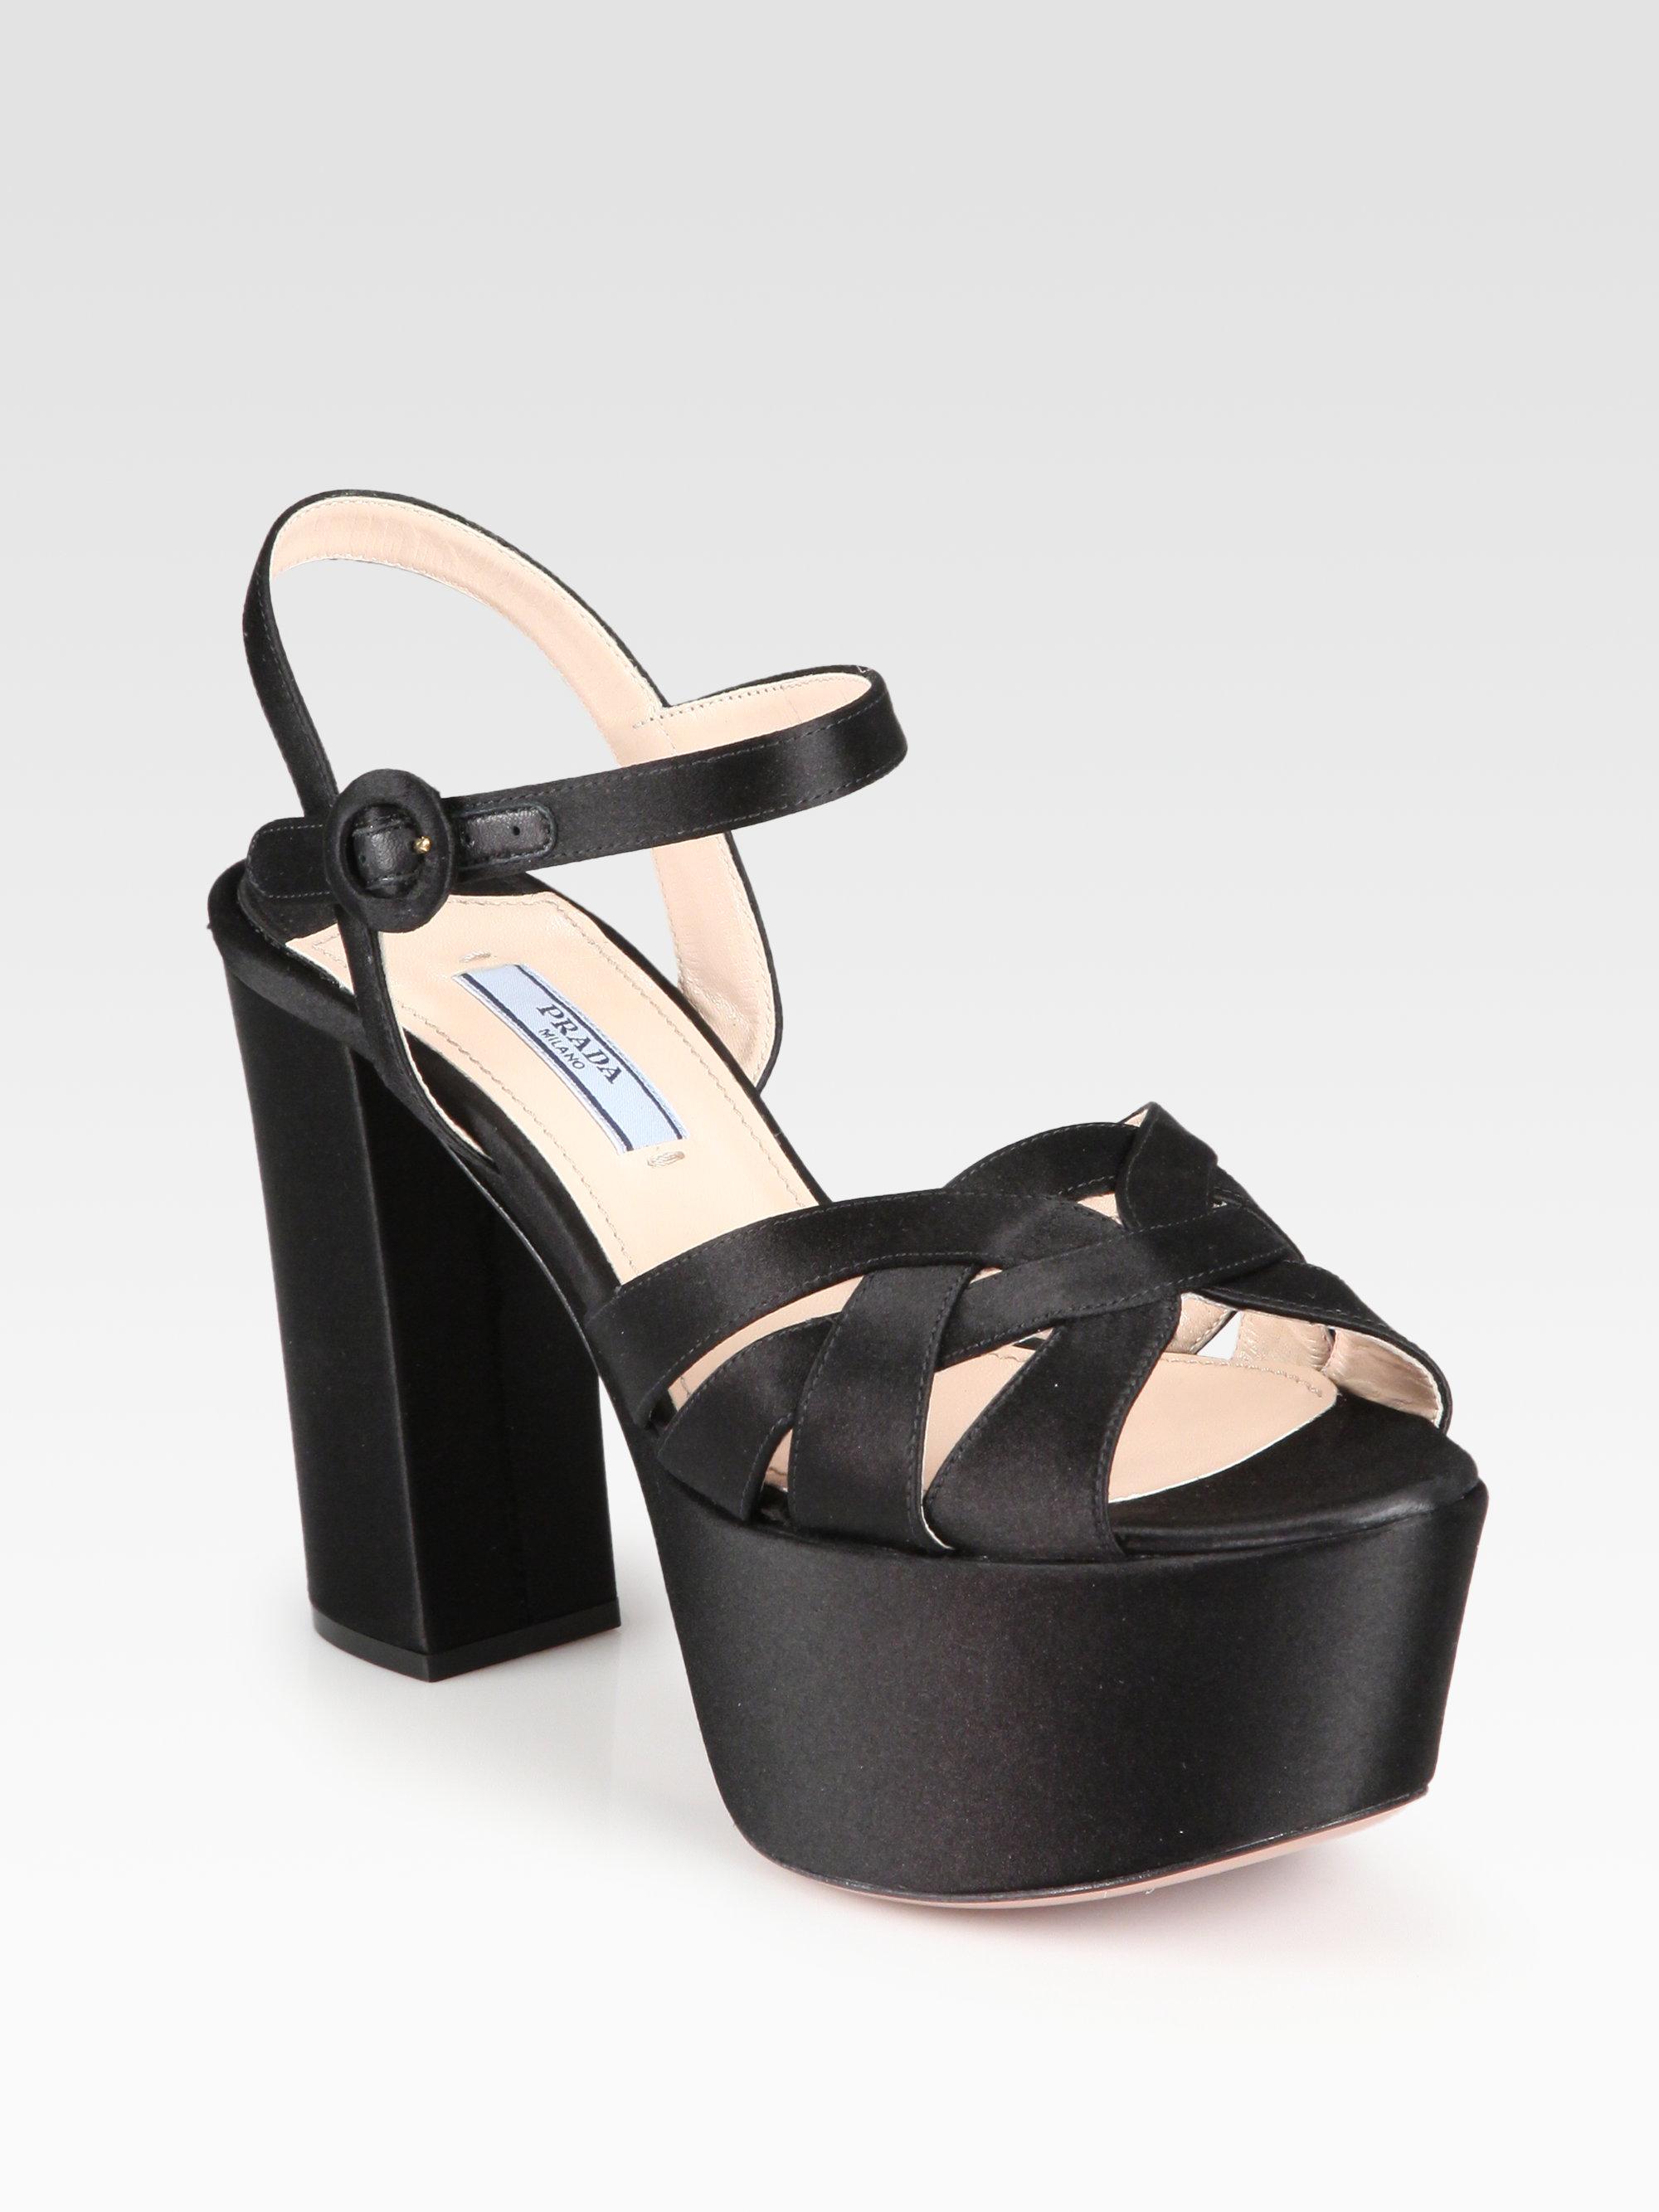 8cd8ebbcffd6 Lyst - Prada Satin Platform Sandals in Black